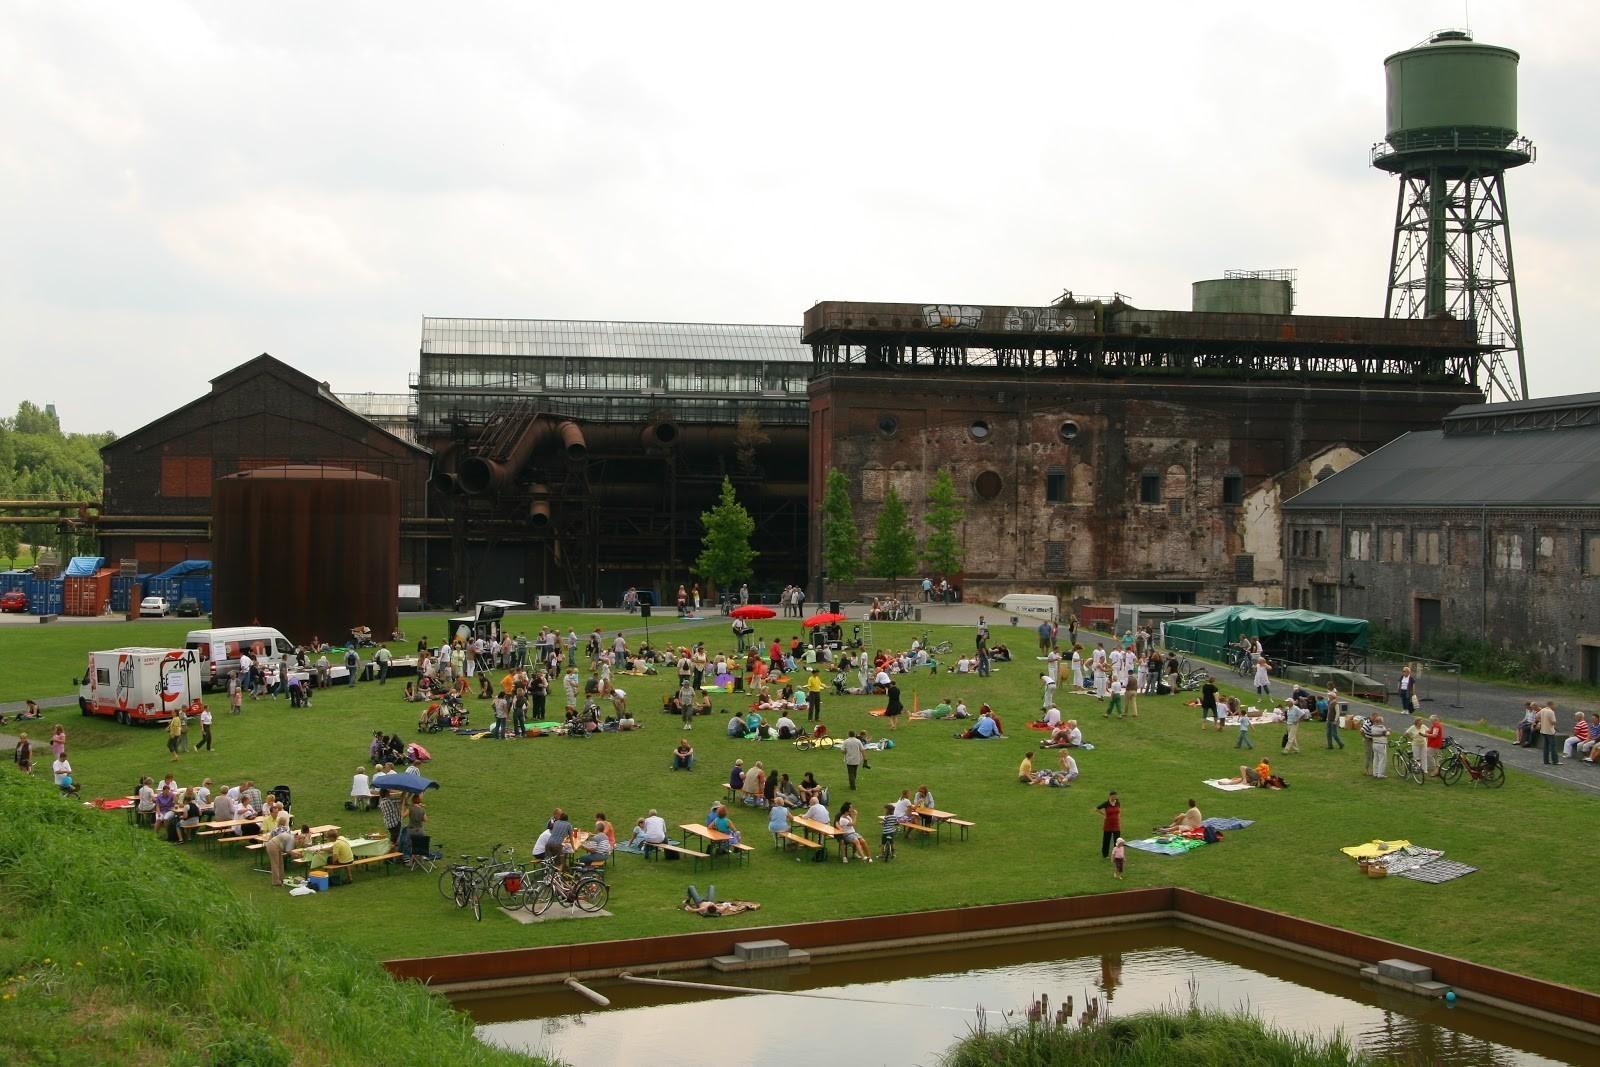 Today, visitors to Westpark Bochum, part of the Emscher Landscape Park, can picnic beside former steelworks.